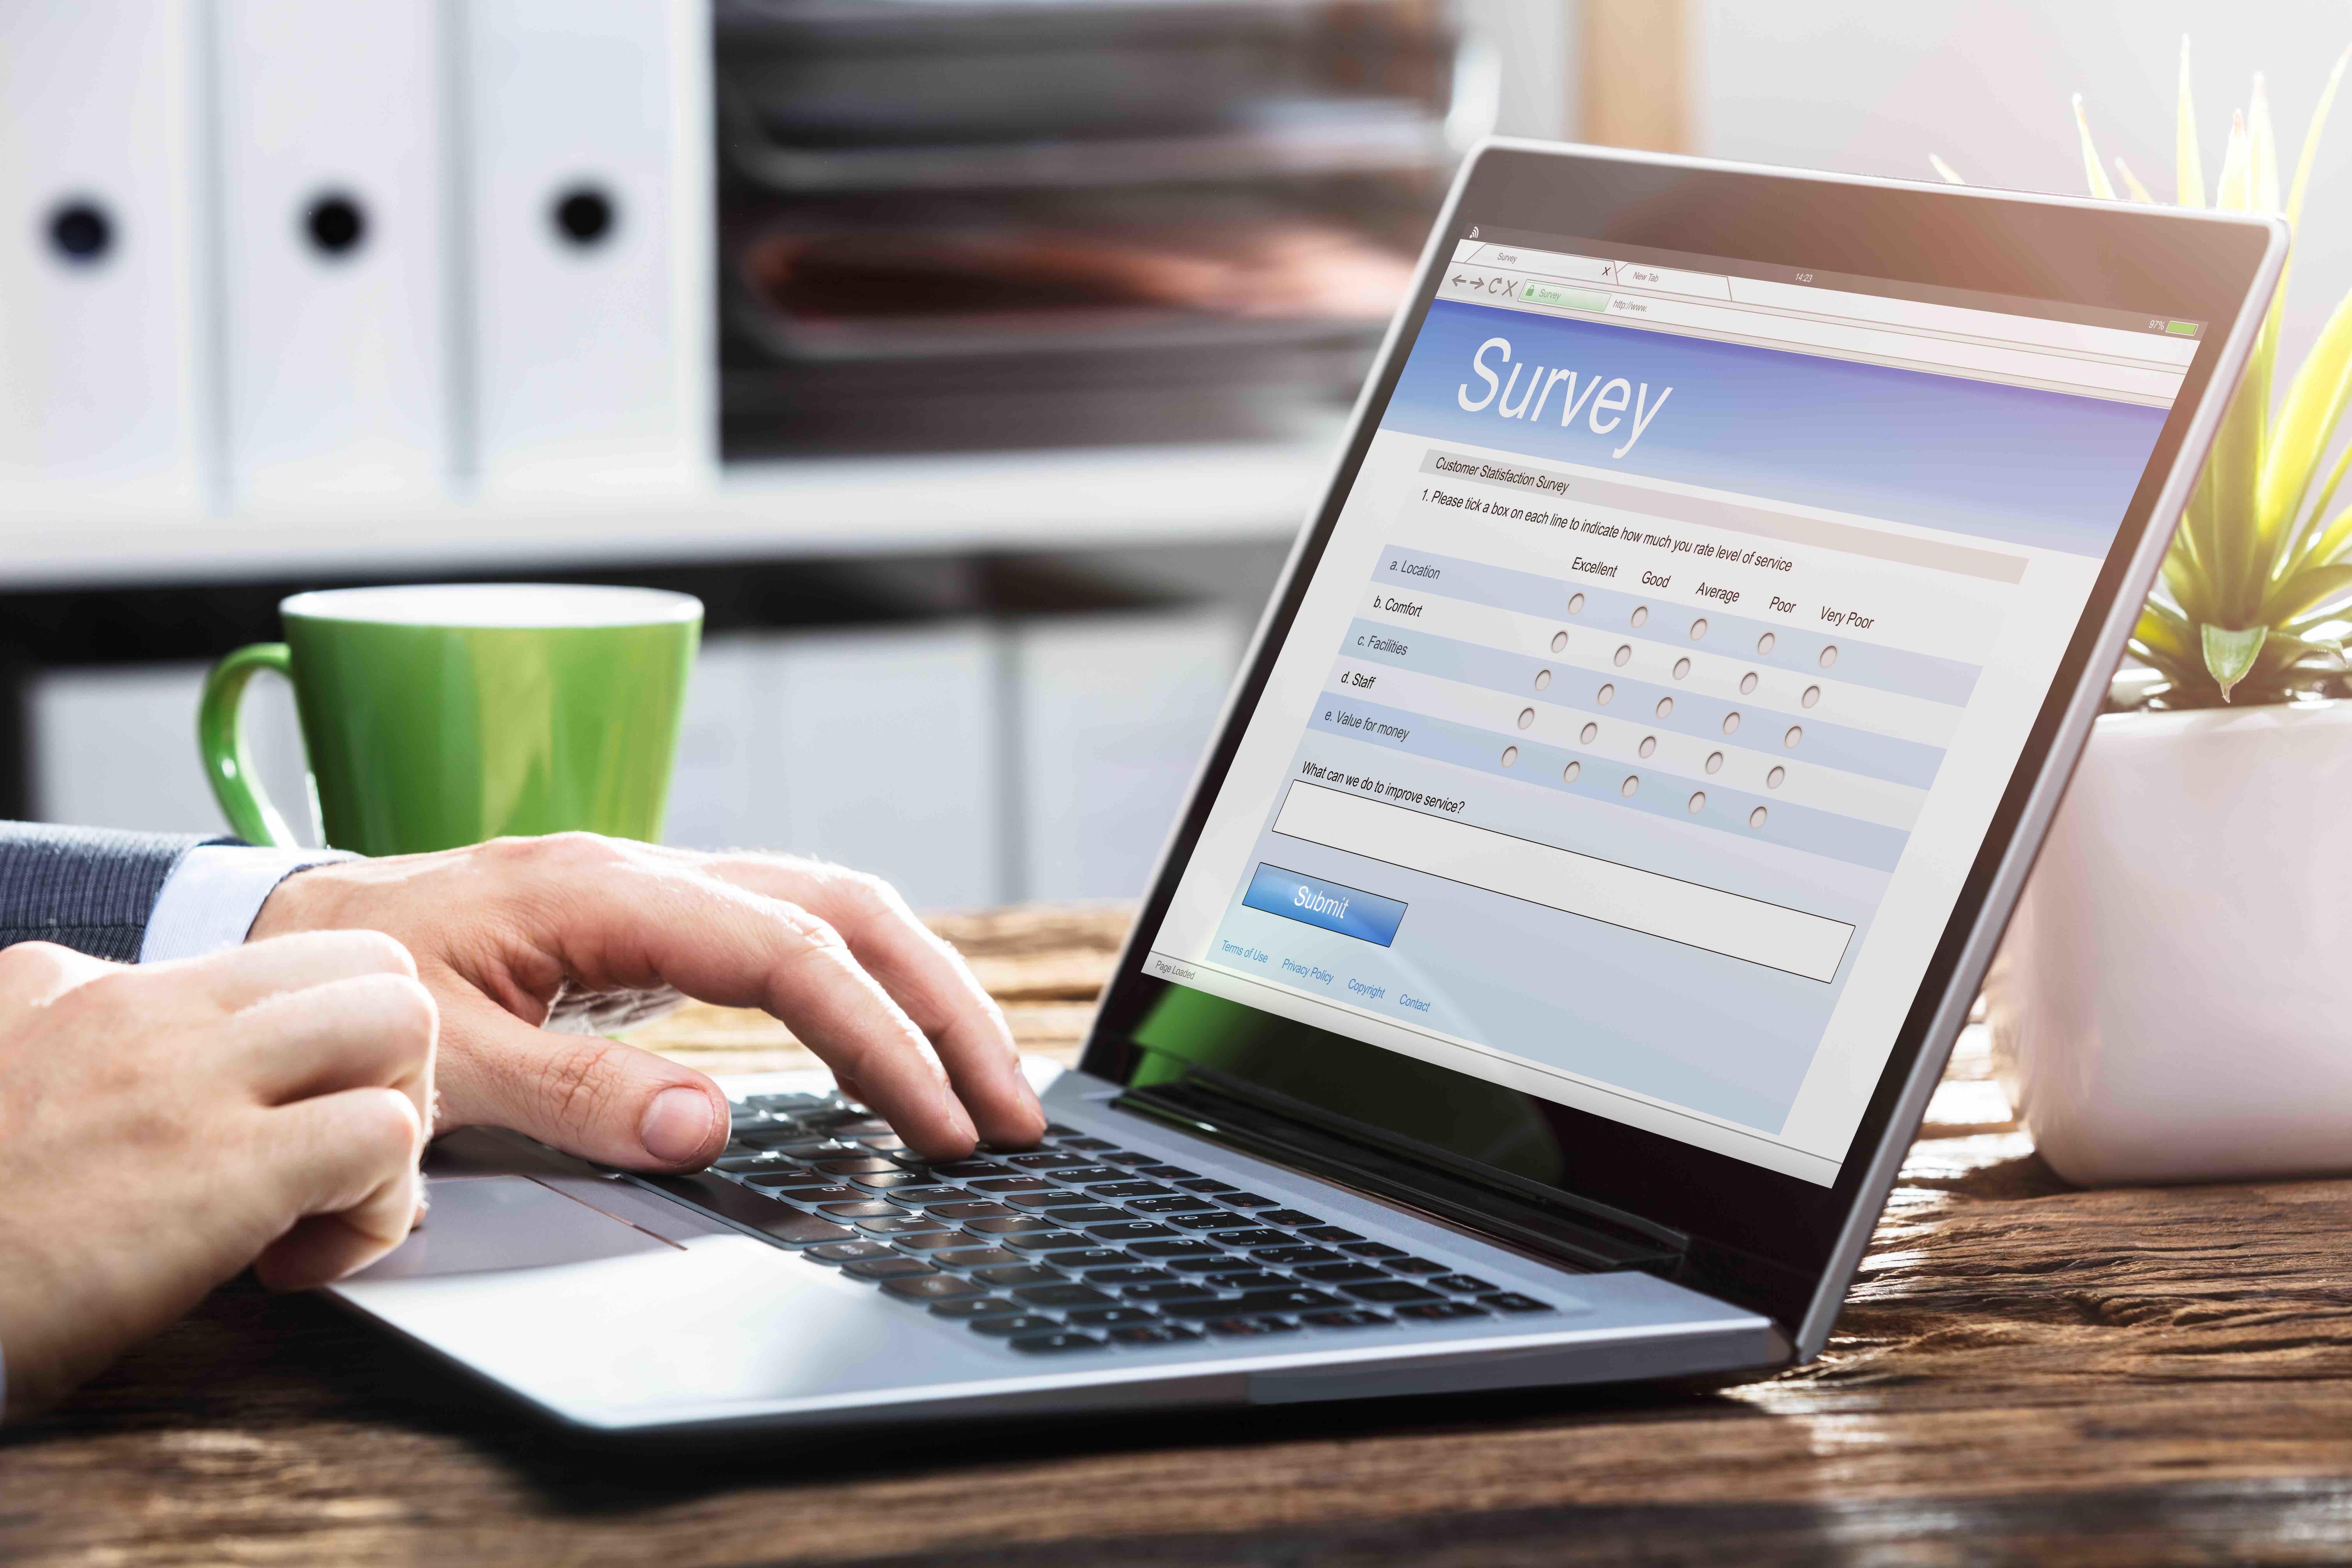 food-marketing-survey-research-laptop